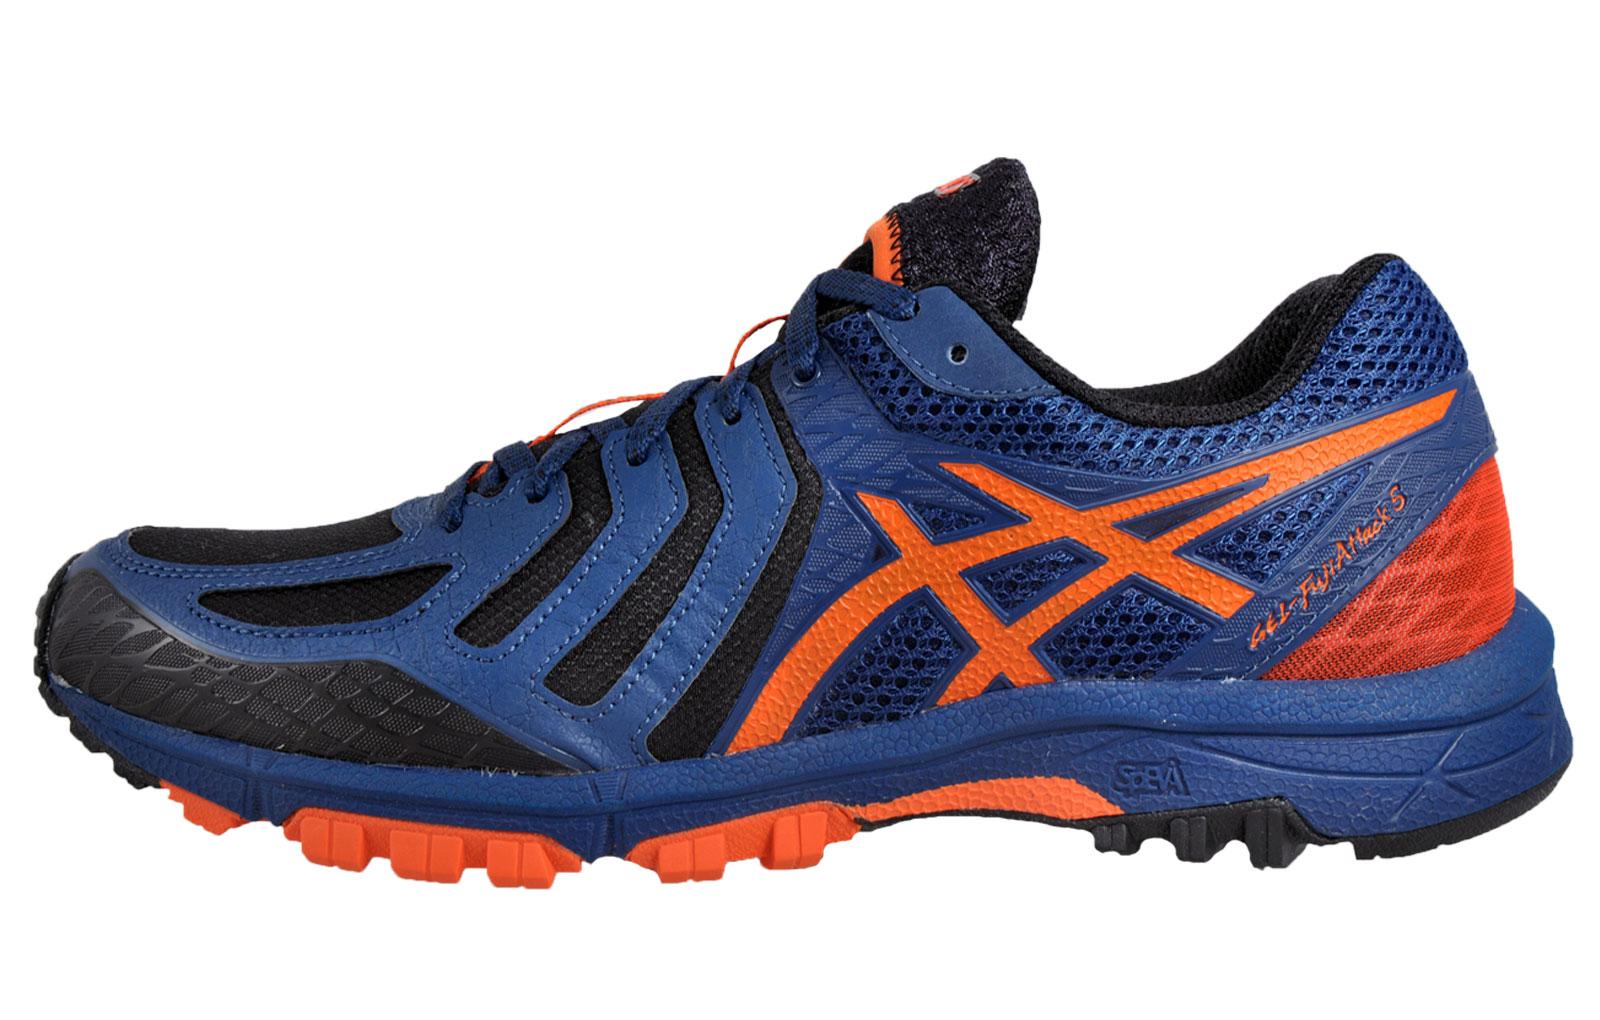 Asics Gel Fuji Attack 5 All Terrain Running Shoes Outdoor